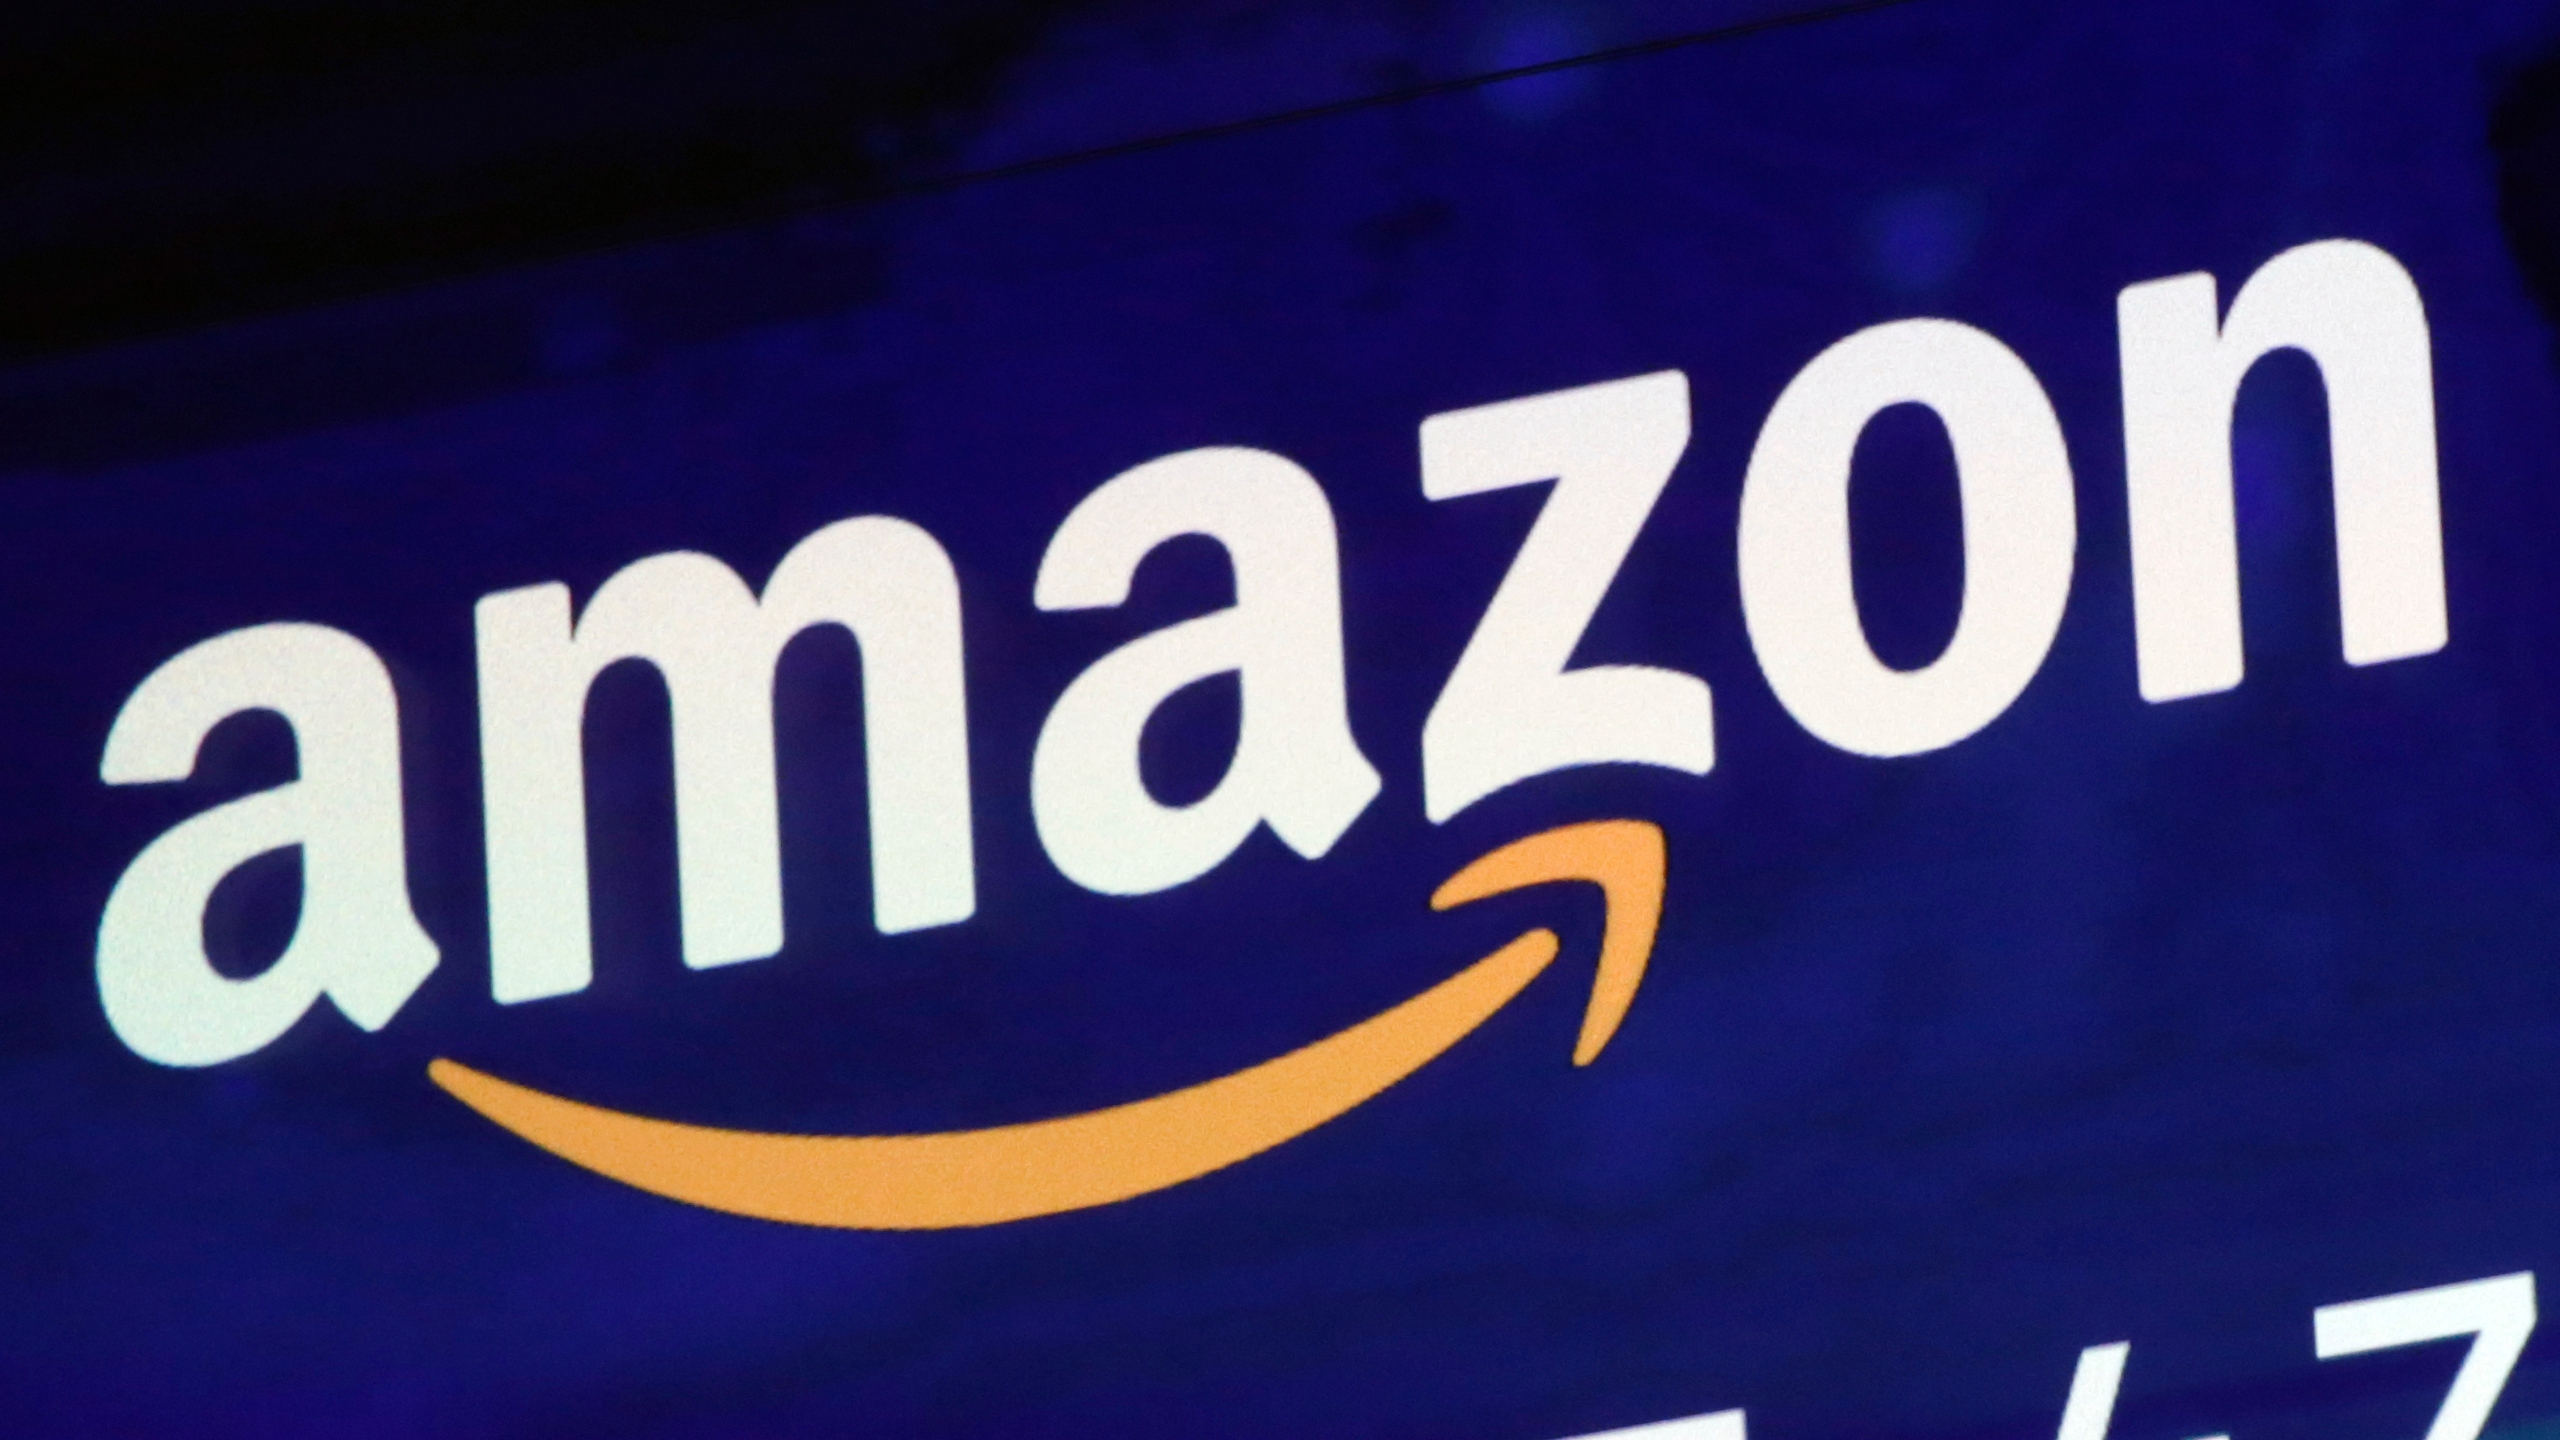 Amazon_Wages_58343-159532.jpg30577350